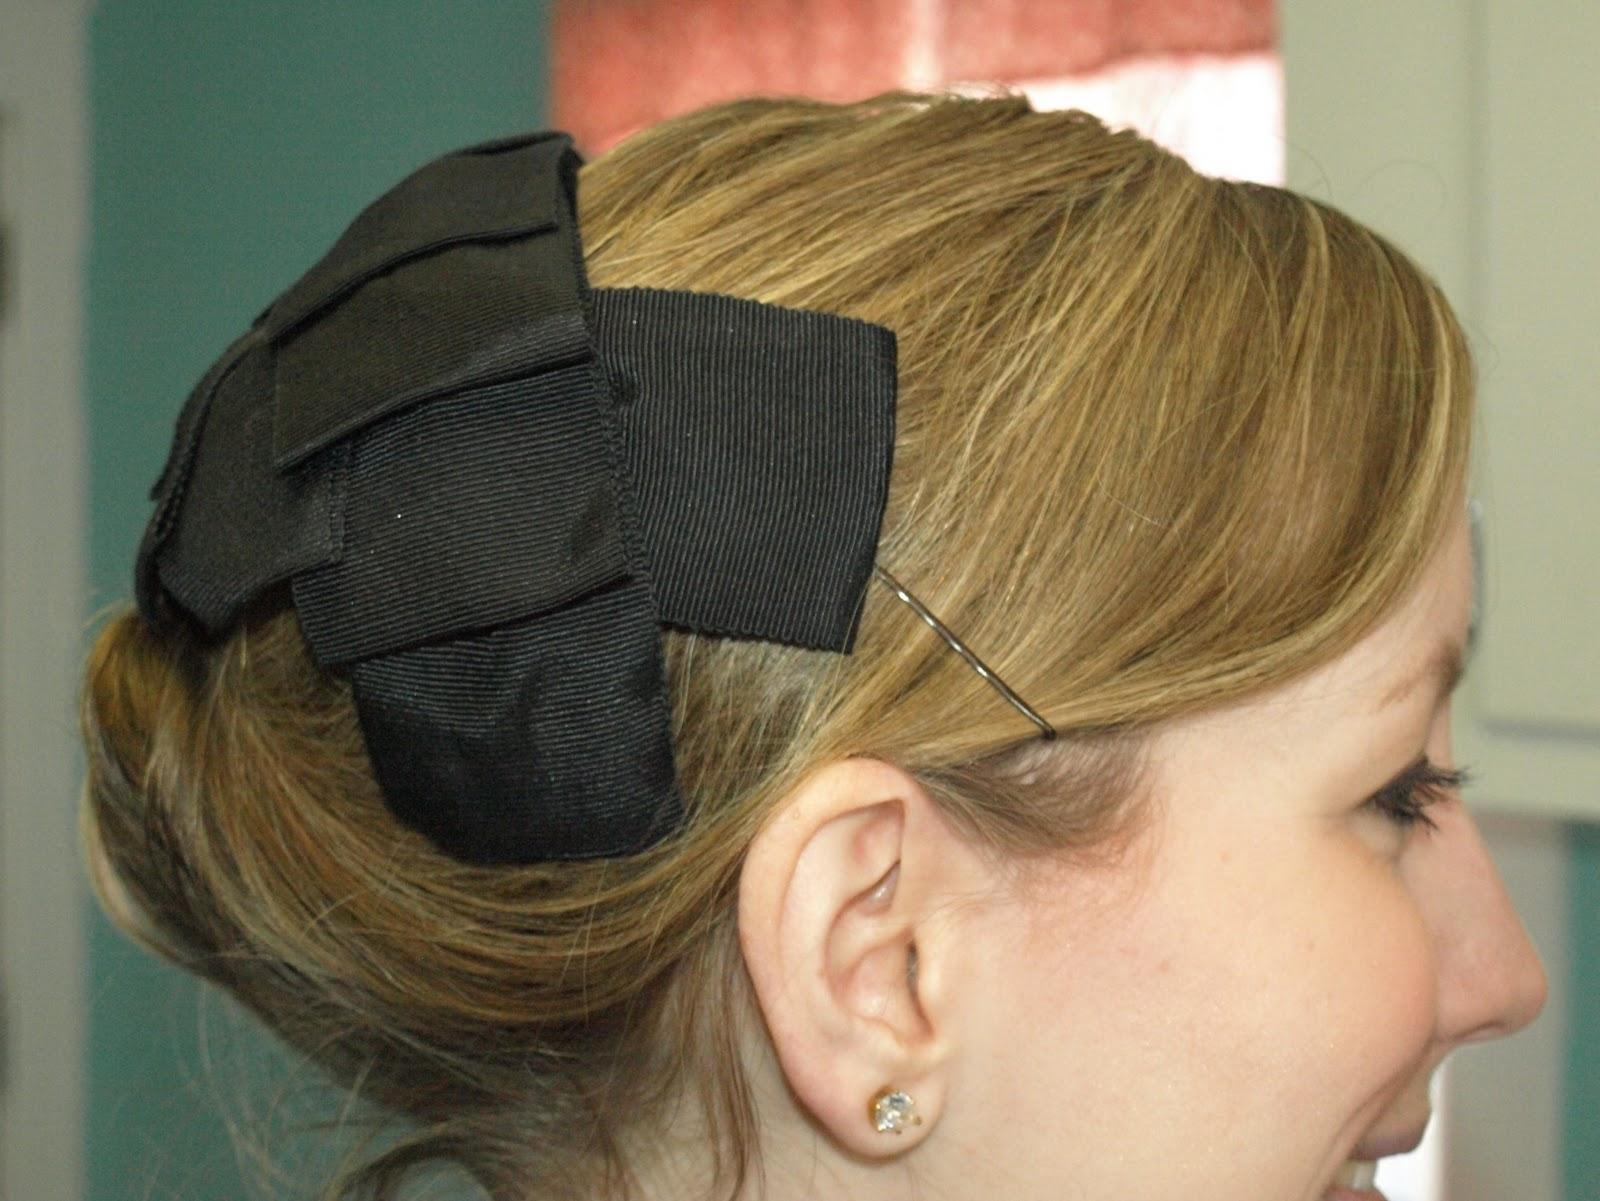 http://3.bp.blogspot.com/_JyLeoqGoh5g/TUWq1b2nXuI/AAAAAAAABQ0/FBzGvpOhMHs/s1600/black+50s+hat+1.jpg